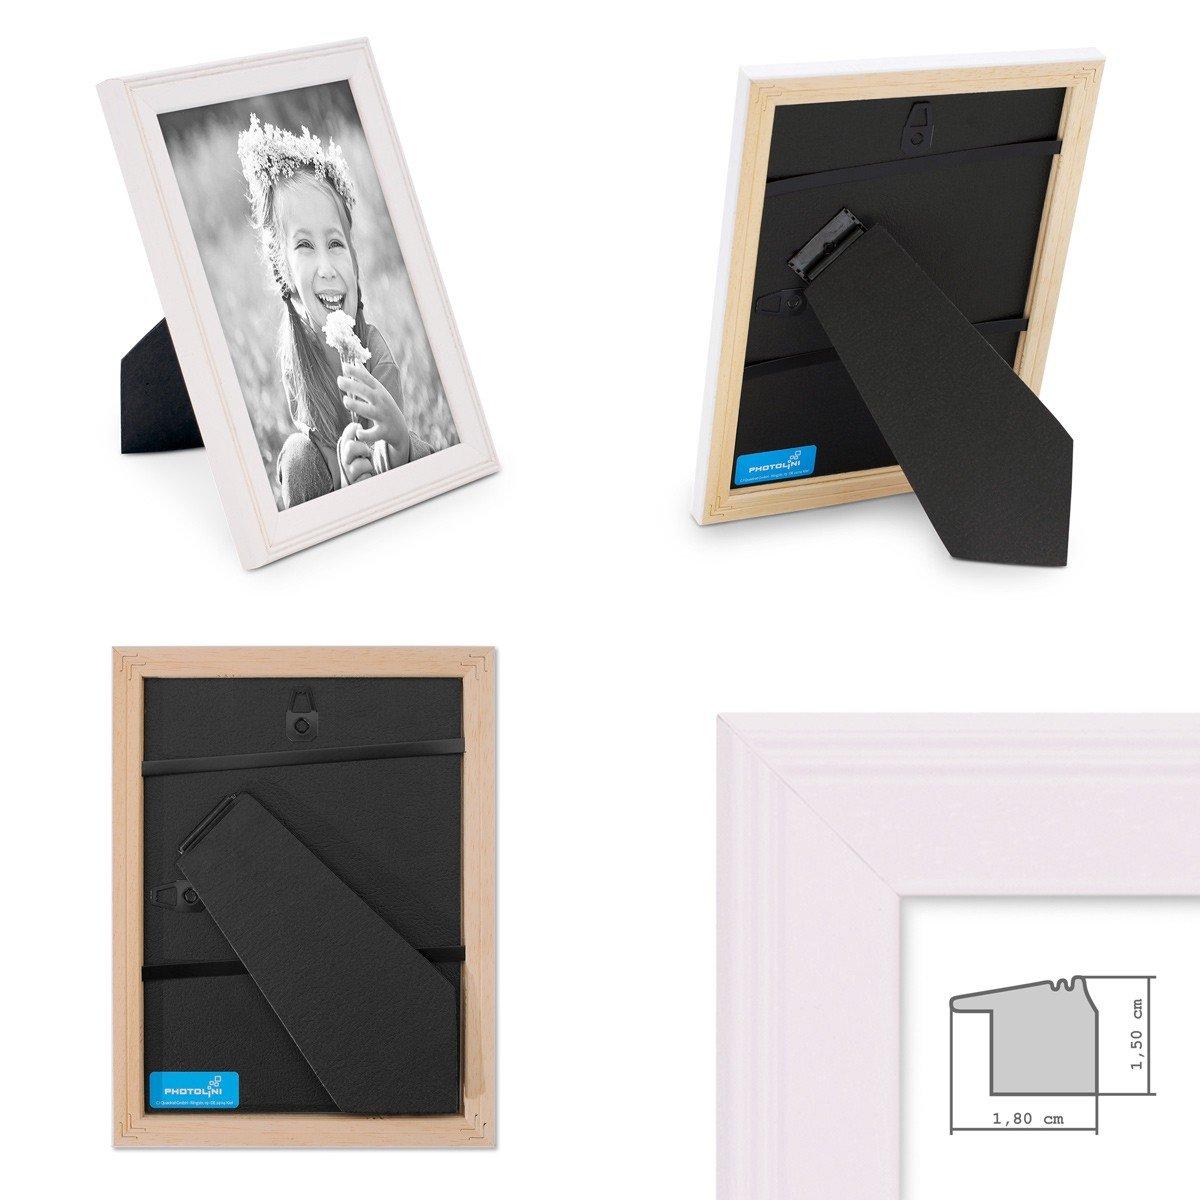 Amazon.de: Photolini 5er Set Landhaus-Bilderrahmen 13x18 cm Weiss ...